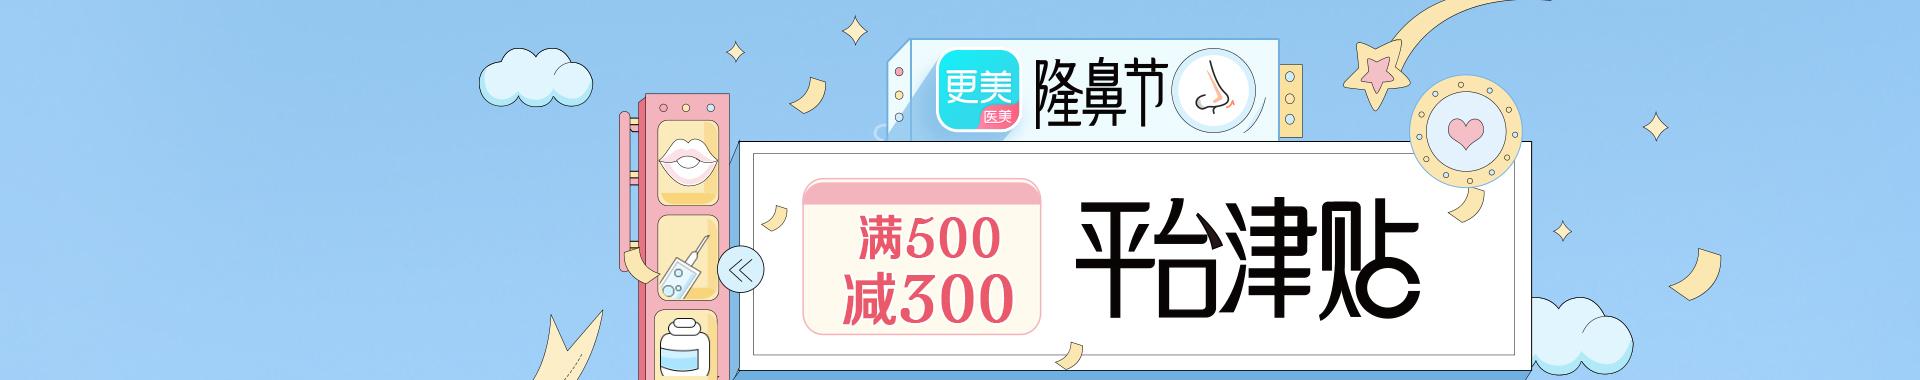 pc banner主会场